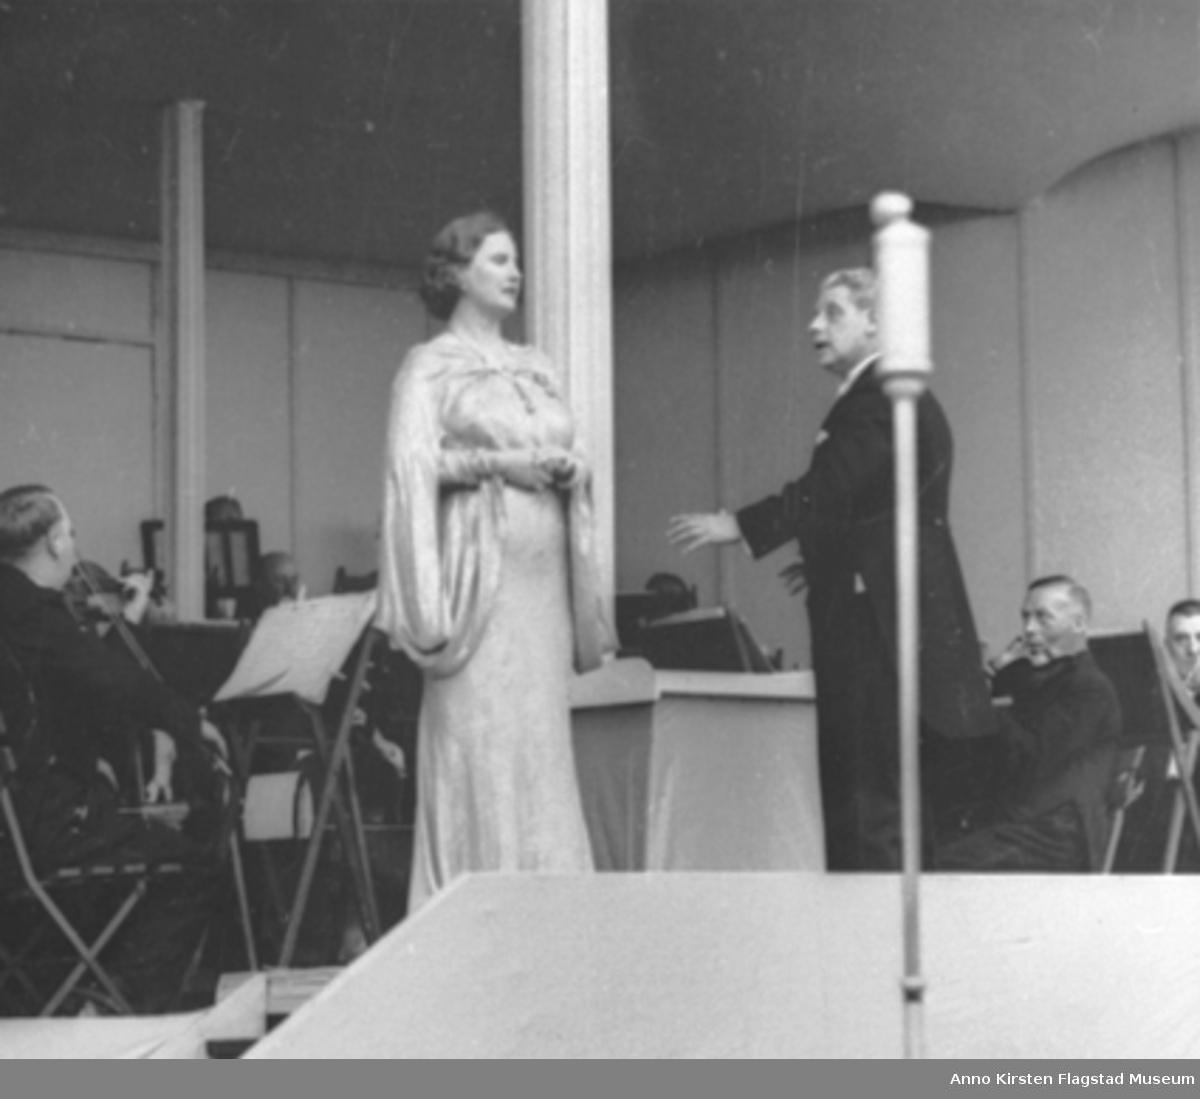 Kirsten Flagstad ved friluftskonserten på Frogner Stadion, Oslo 7. juli 1937. Dirigent Ole Flagstad. Konserten samlet 15 000 tilhørere. Kirsten Flagstad at the open air concert at Frogner Stadion, Oslo 7 July 1937. Conductor Ole Flagstad. Audience of 15 000.